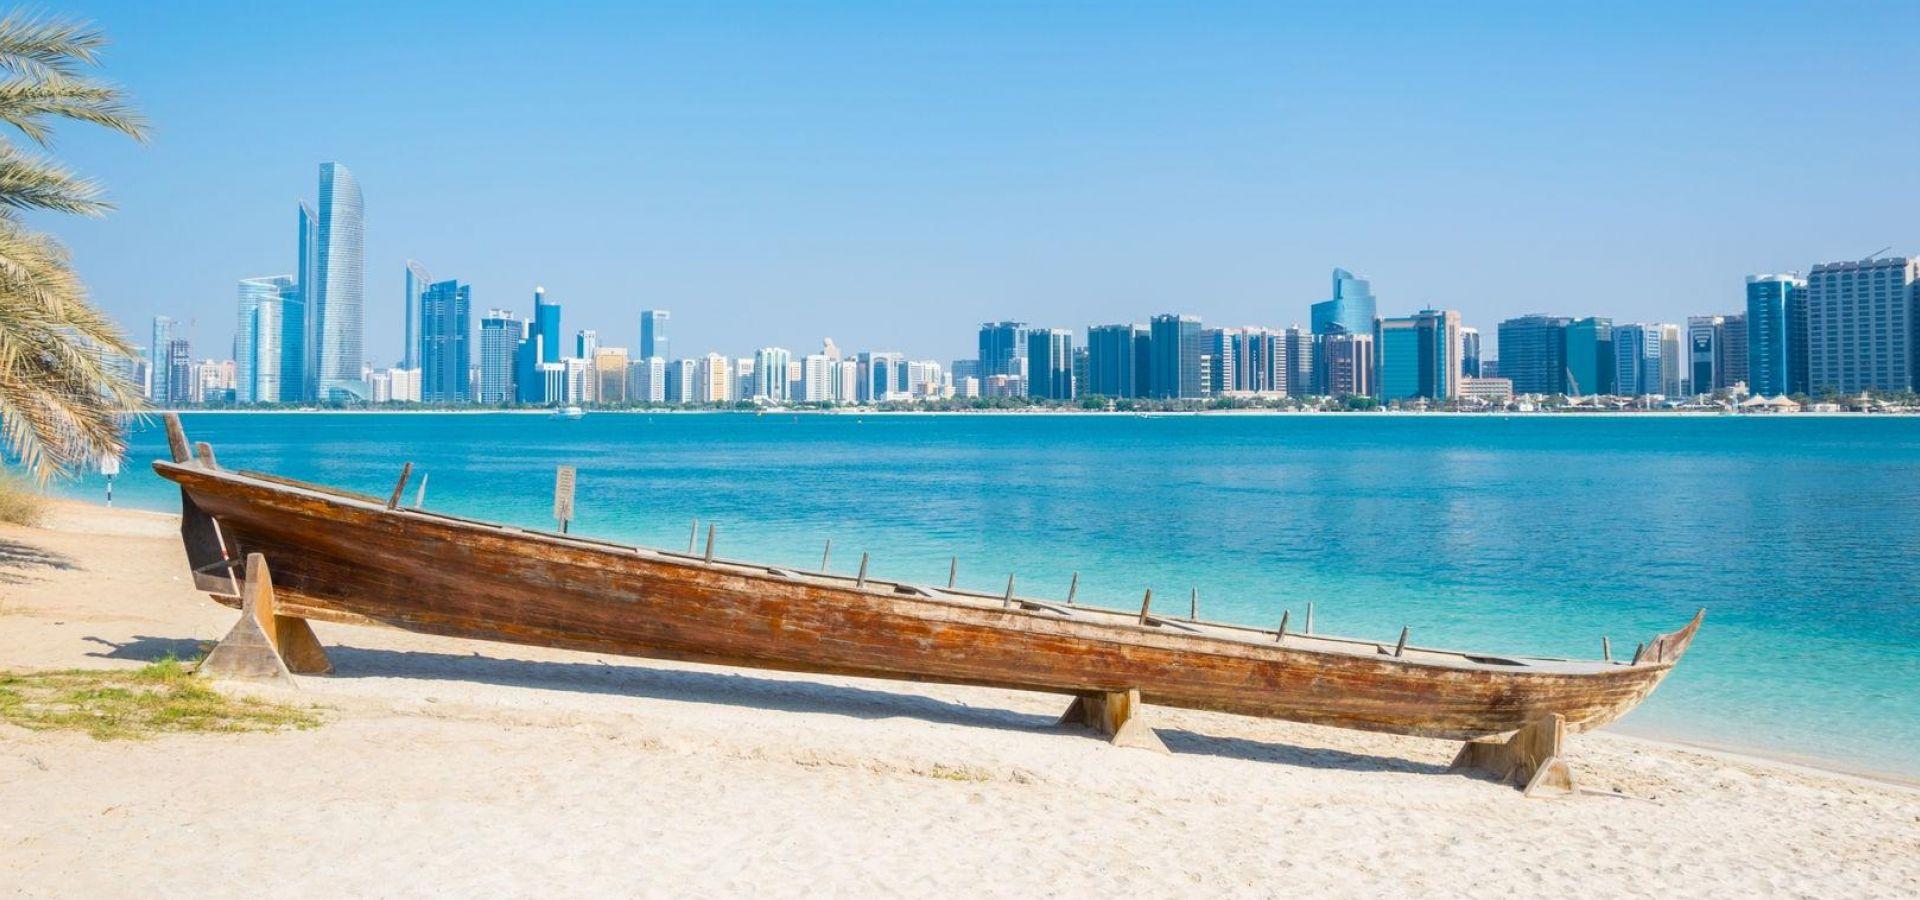 culture hotspots in Abu Dhabi